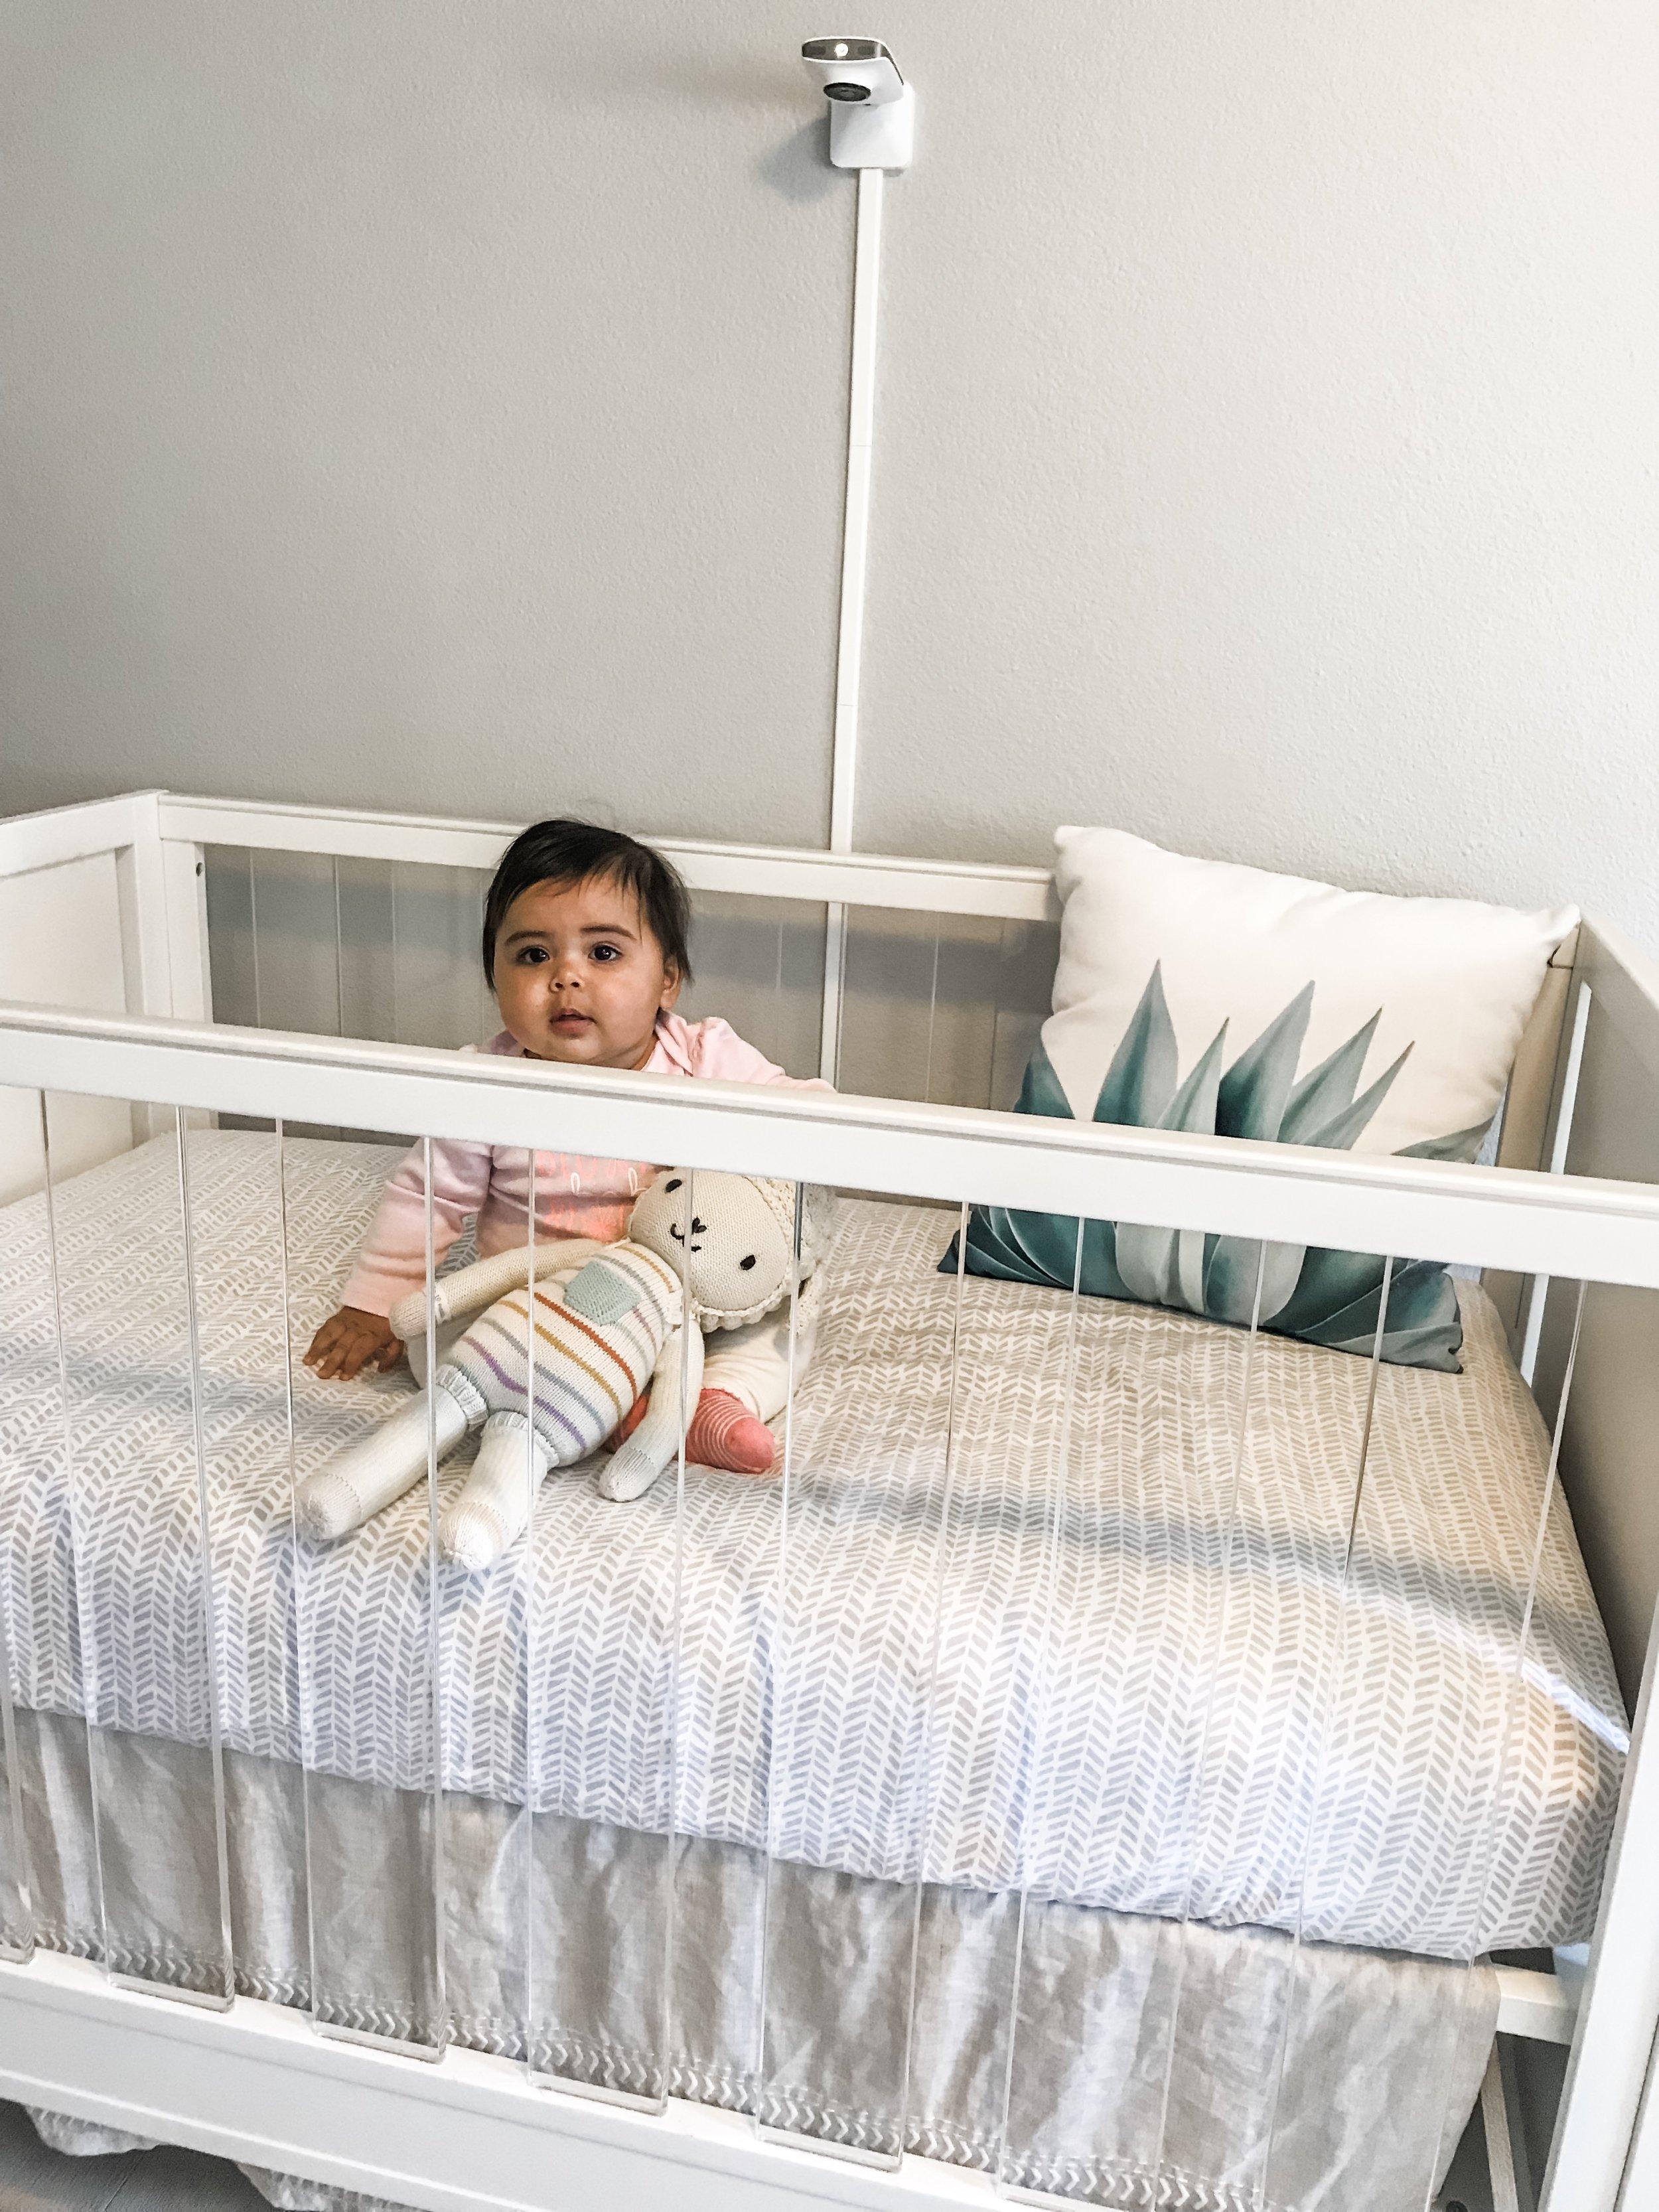 miku baby monitor review